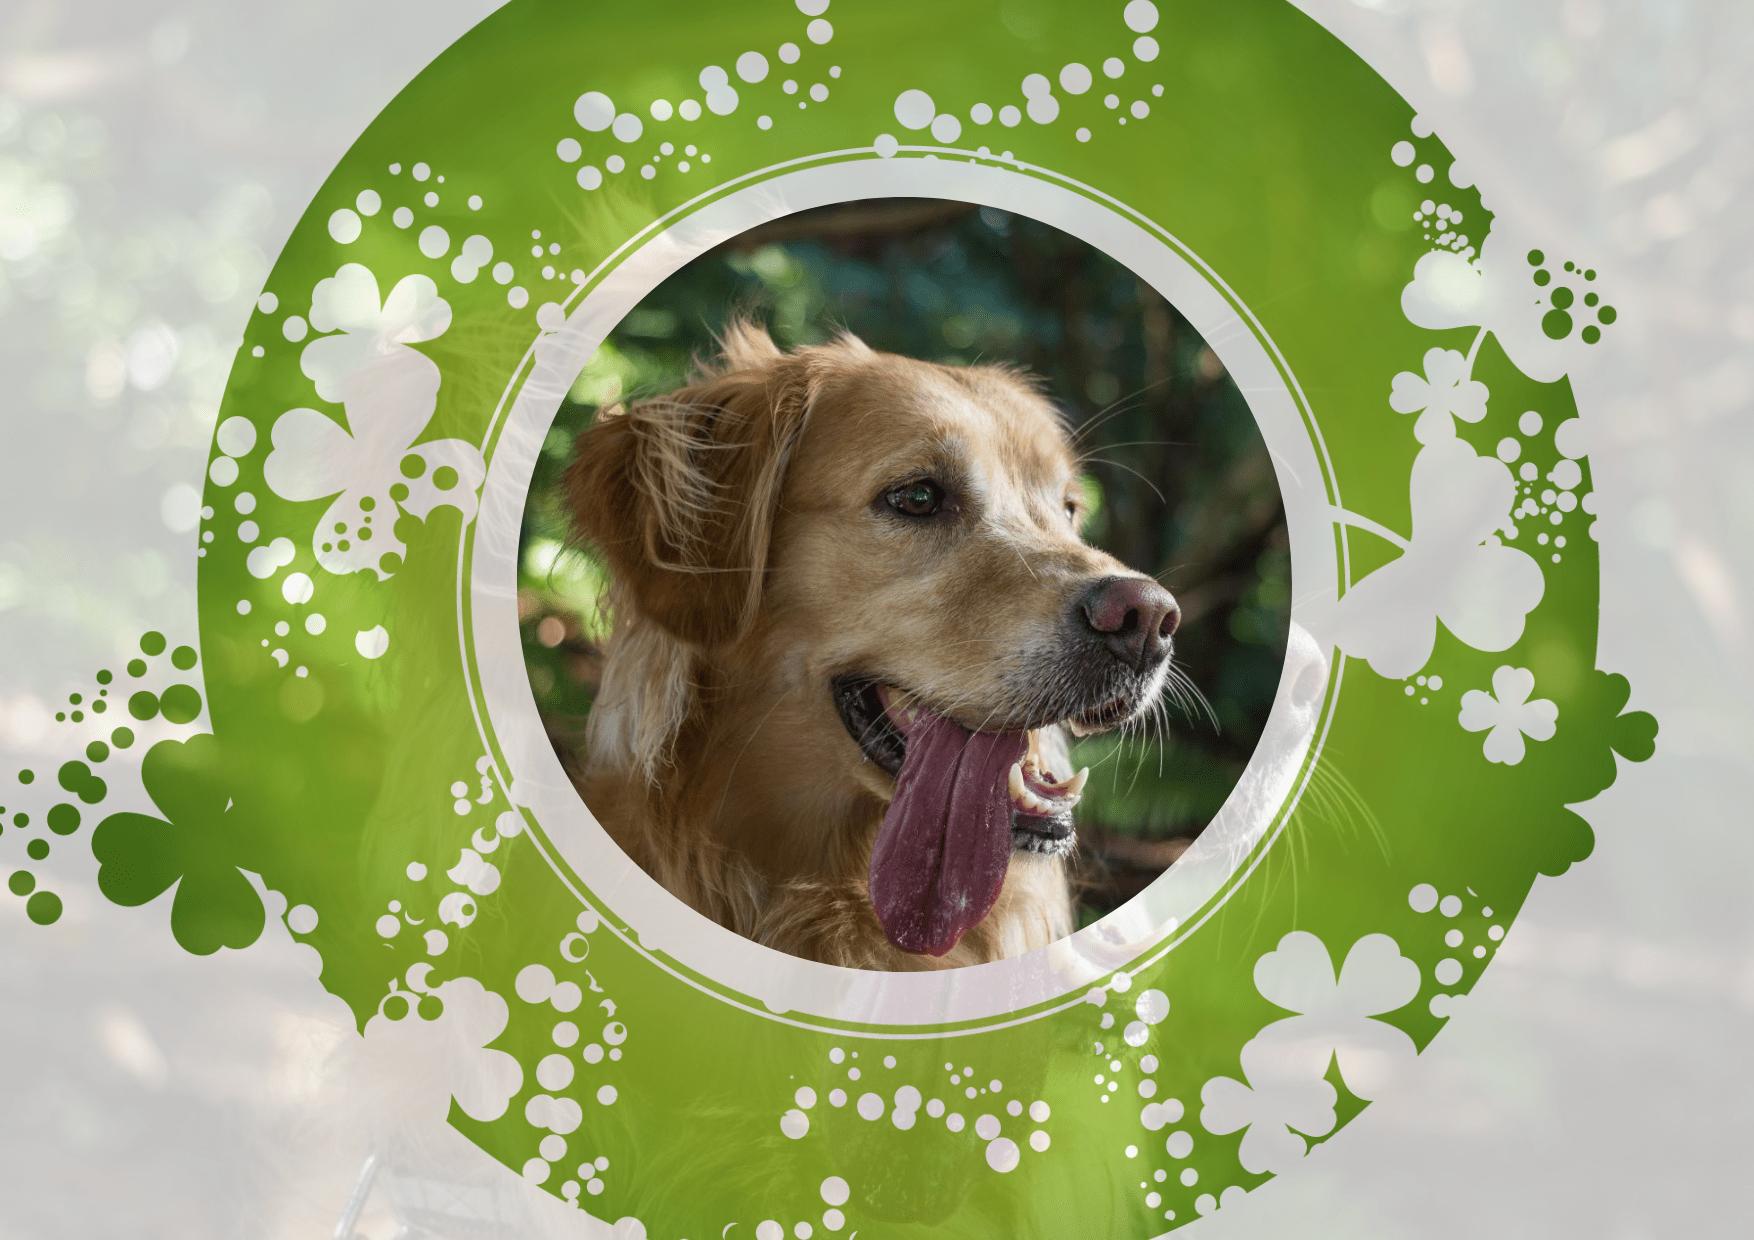 Dog,                Breed,                Product,                Puppy,                Love,                Mockup,                Frame,                Image,                Avatar,                White,                Black,                Yellow,                Lime,                 Free Image